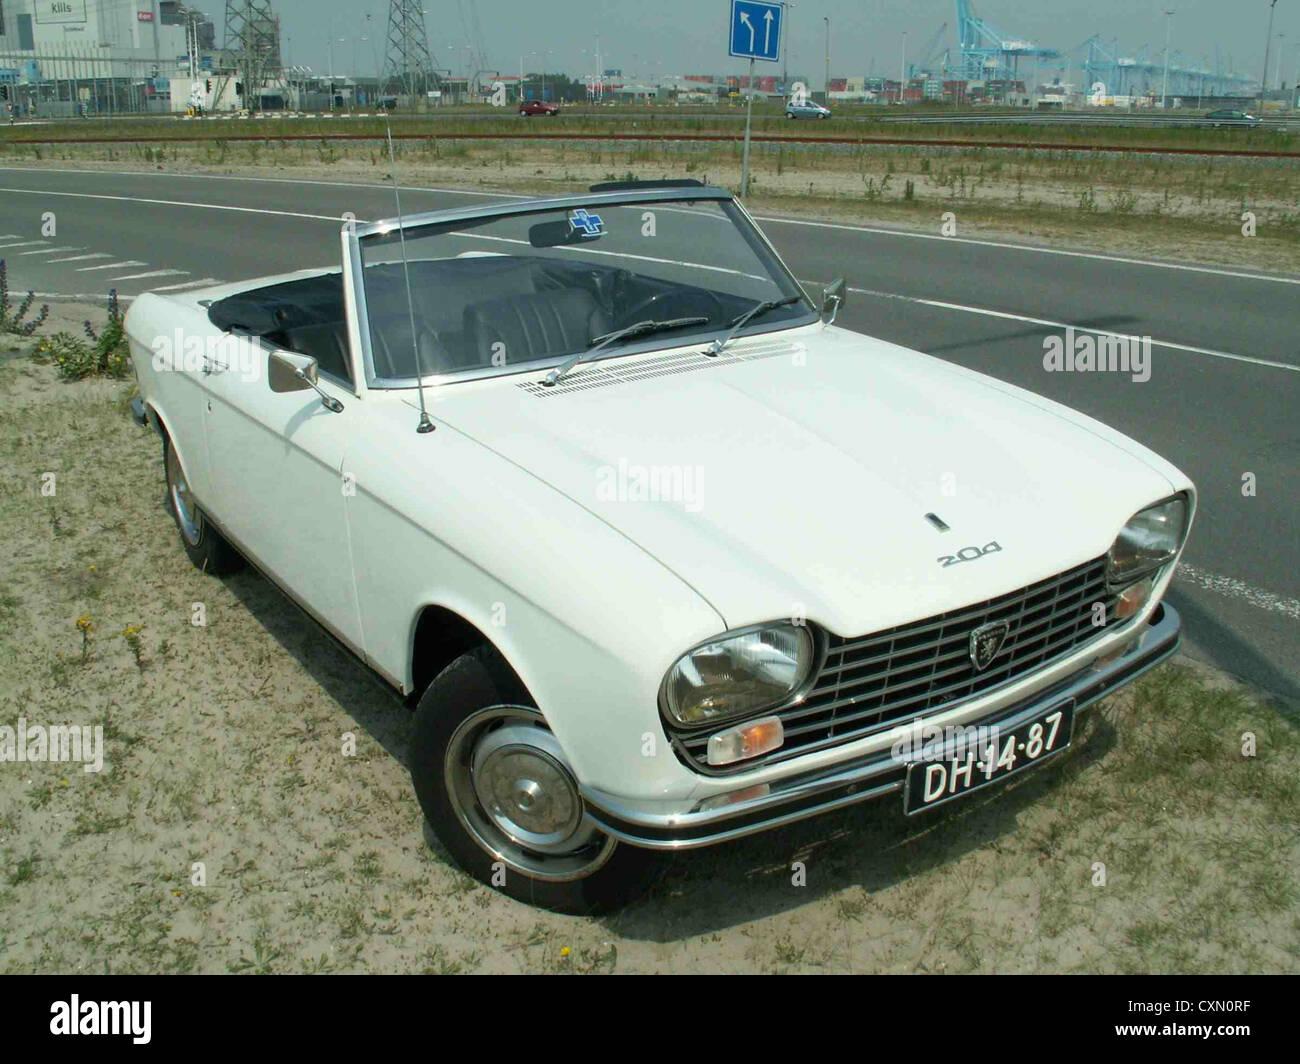 Peugeot 204 Classic Car Stock Photo 50863443 Alamy